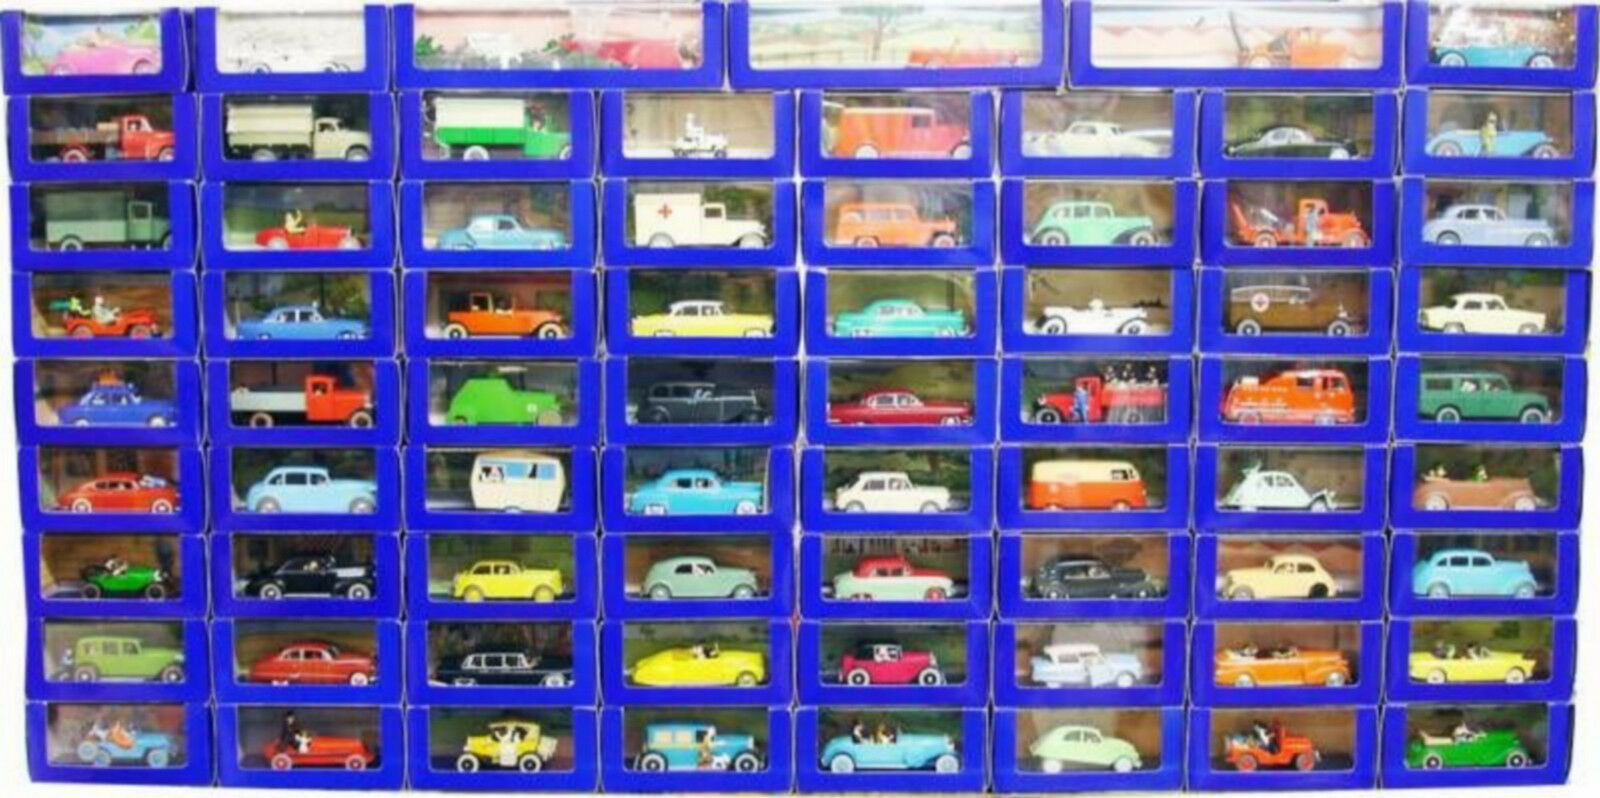 Quatre mers, Xiangyun, Xiangyun, Xiangyun, Fulai, cadeau du Nouvel An, non-stop TINTIN Atlas collection complète 70 voitures ETAT NEUF CERTIFICATS AUTHENTICITE eba164